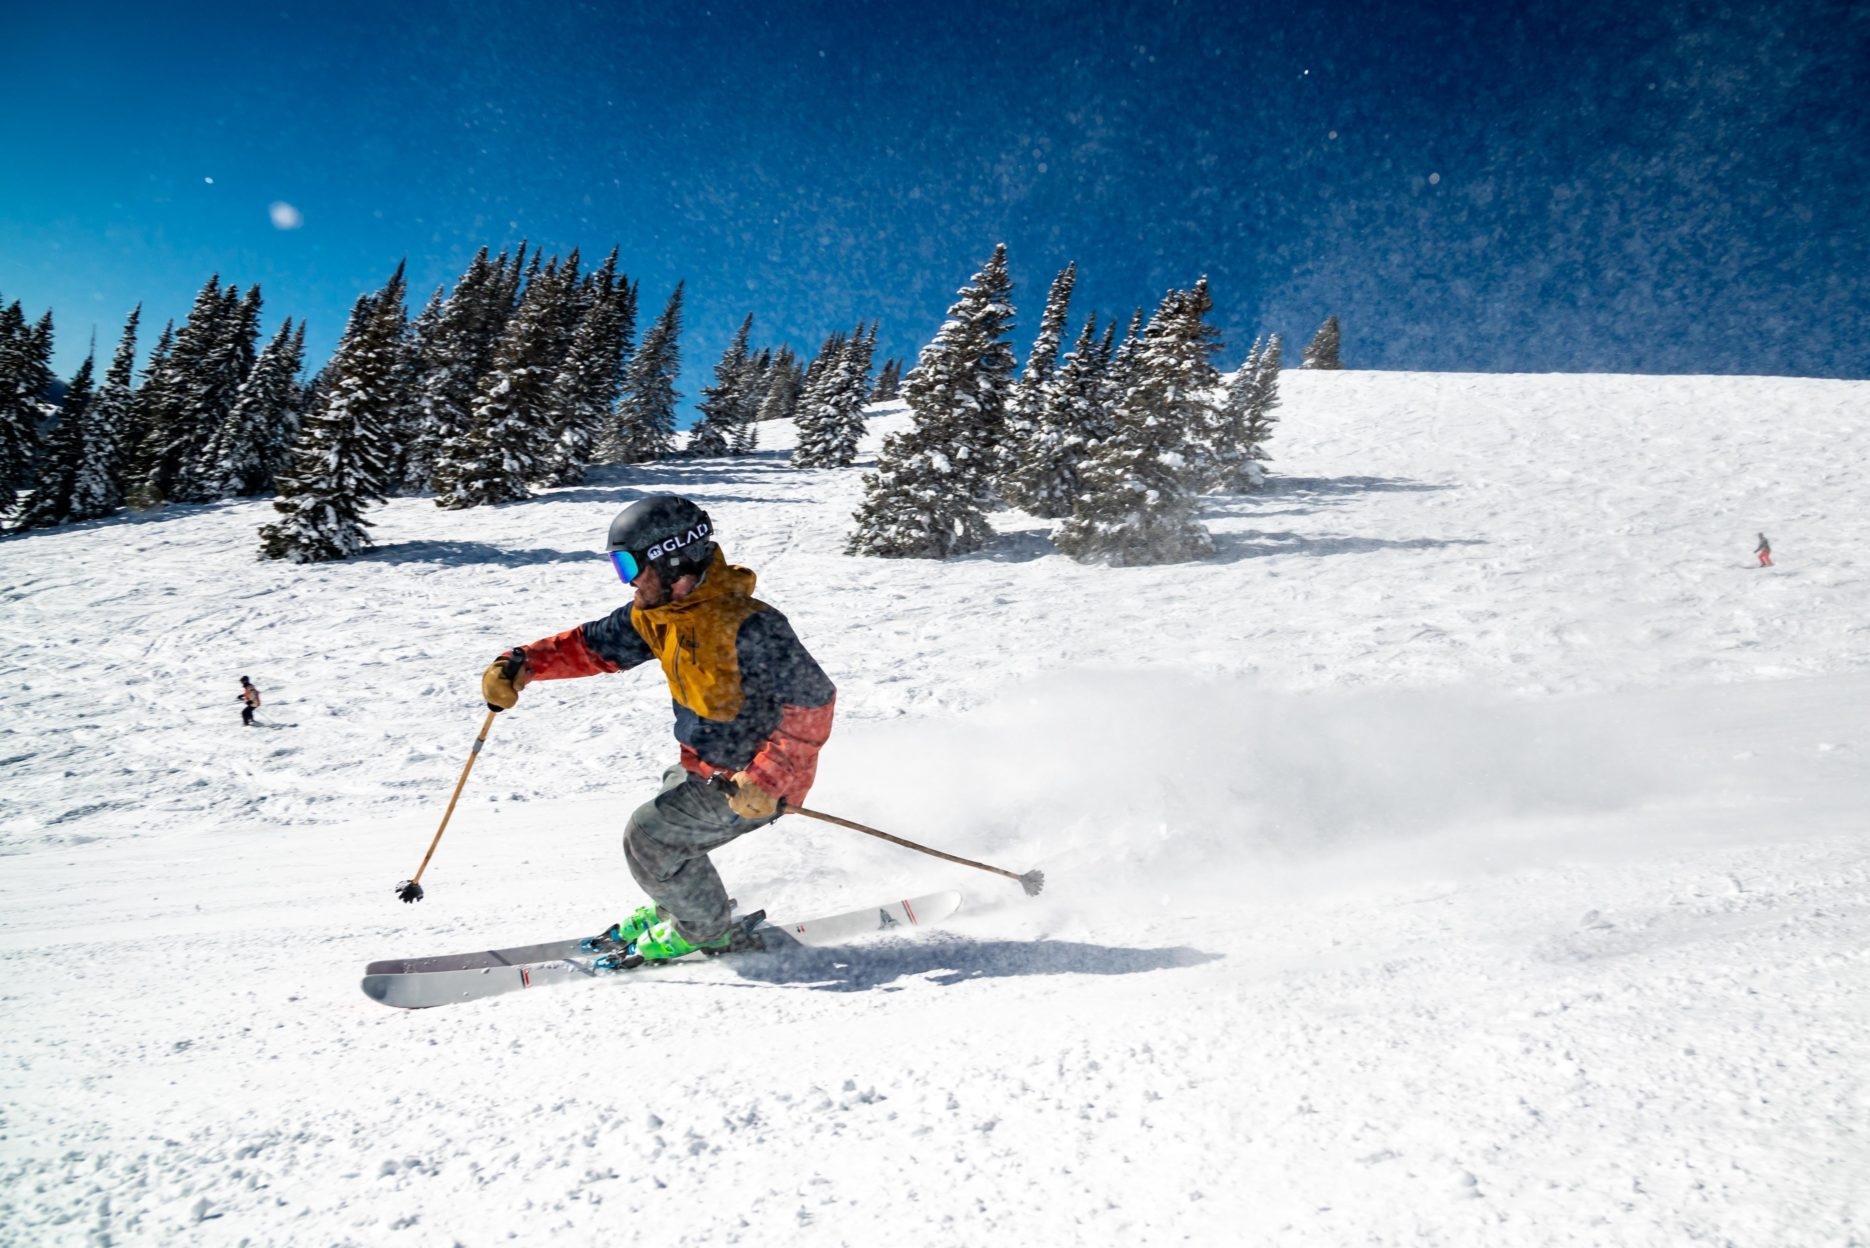 Skiing popularity in China Credit: Unsplash